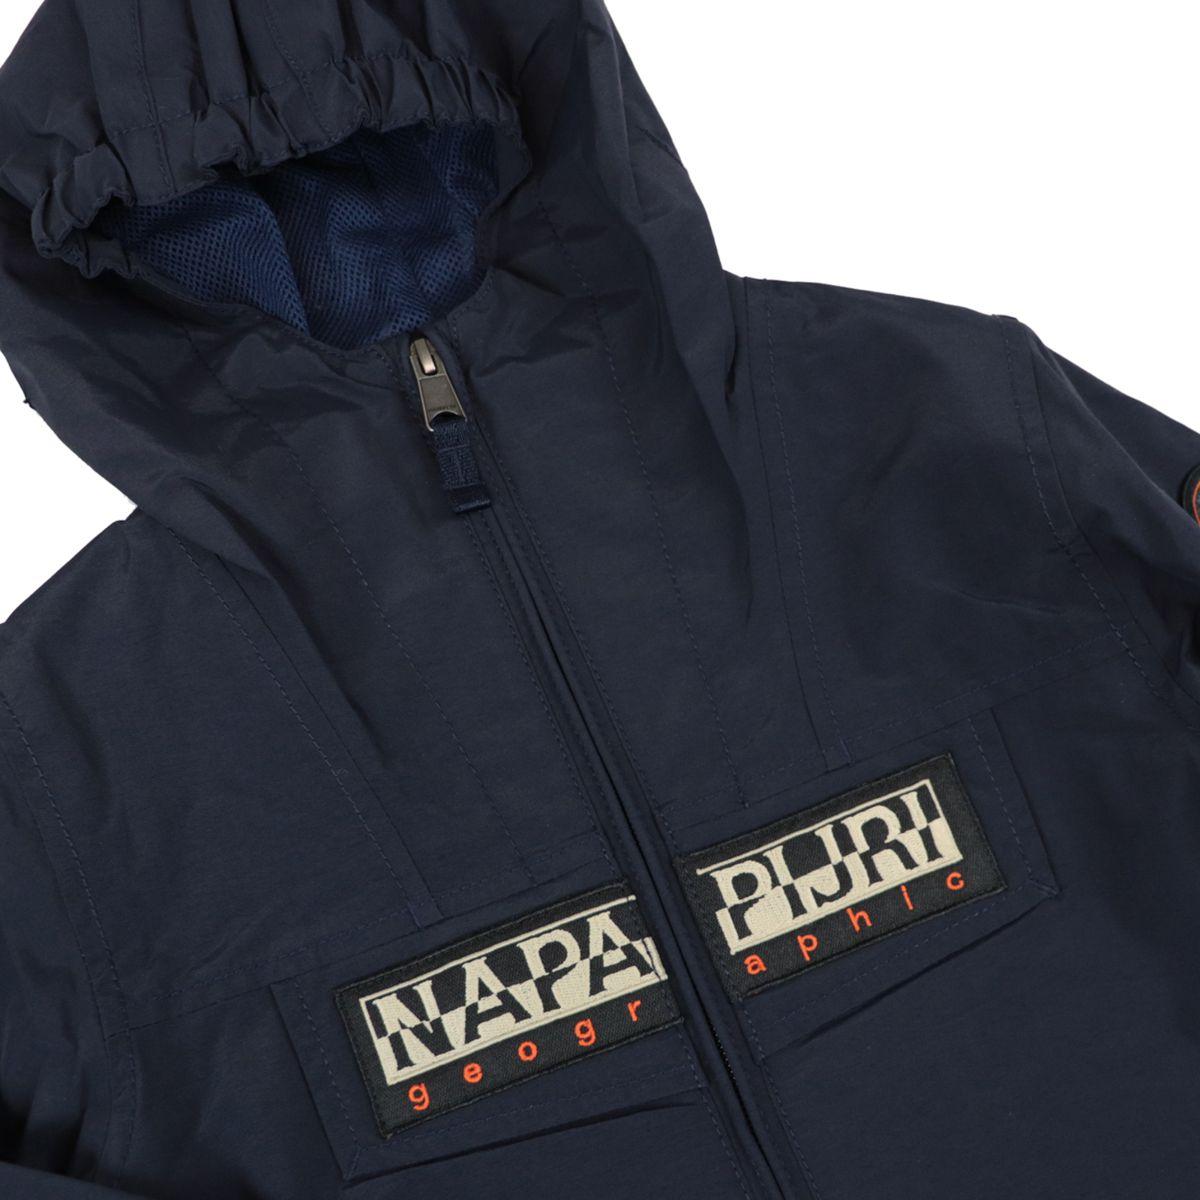 K Rainforest S OP 2 nylon jacket with hood and logo Blue NAPAPIJRI